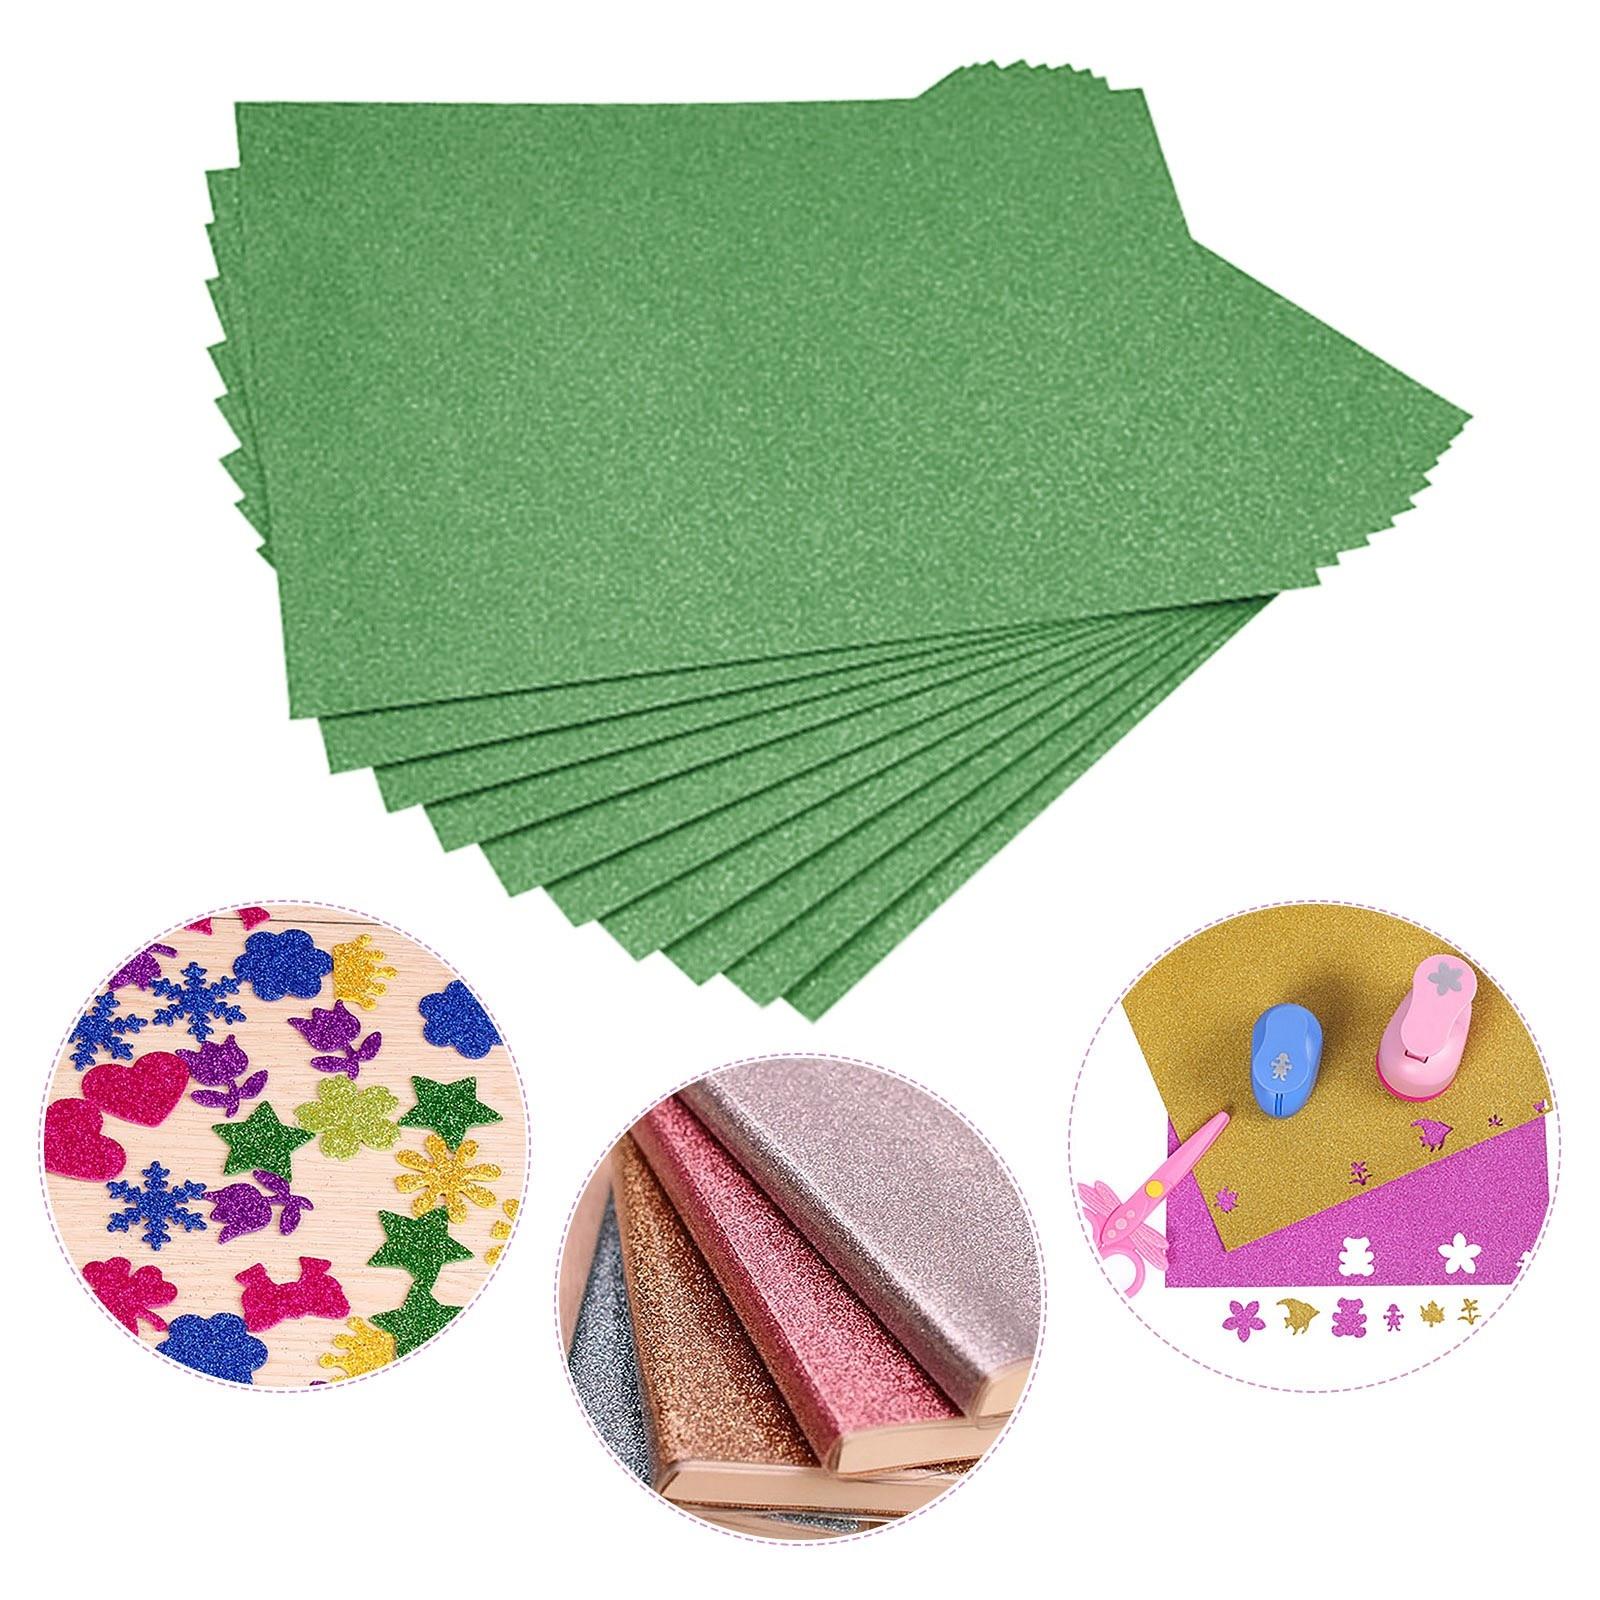 Craft Paper 10/20/30/40/50pcs xFlash Card Paper Flash Shiny Craft Paper Advanced A4 Flash Paper No Adhesive Flash Card Paper New